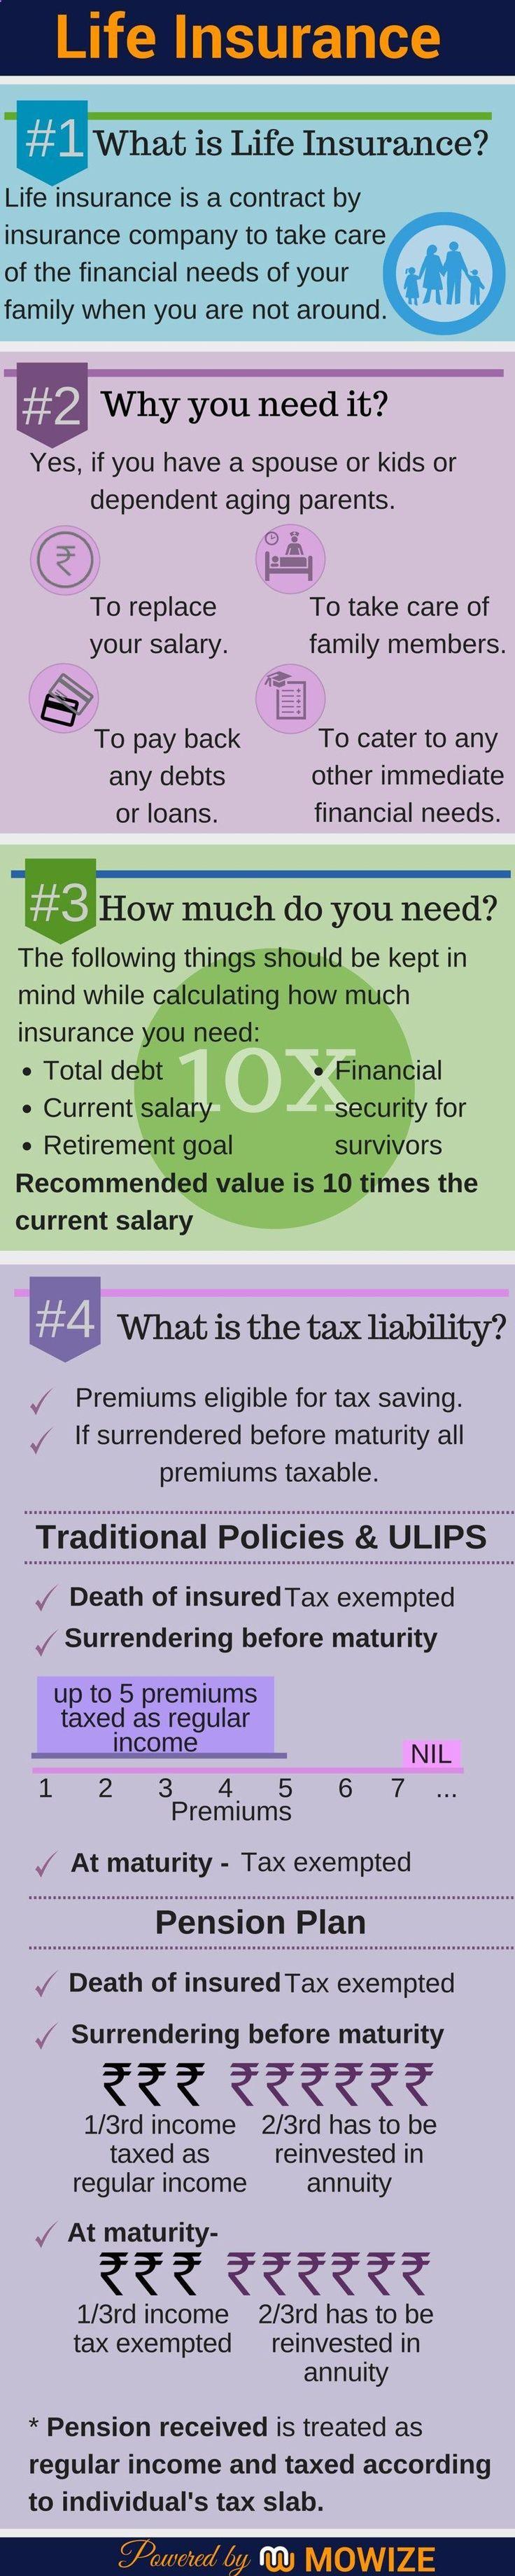 Life Insurance List of Best Term Life Insurance Companies for 2017 #LifeInsuranceFactsTips